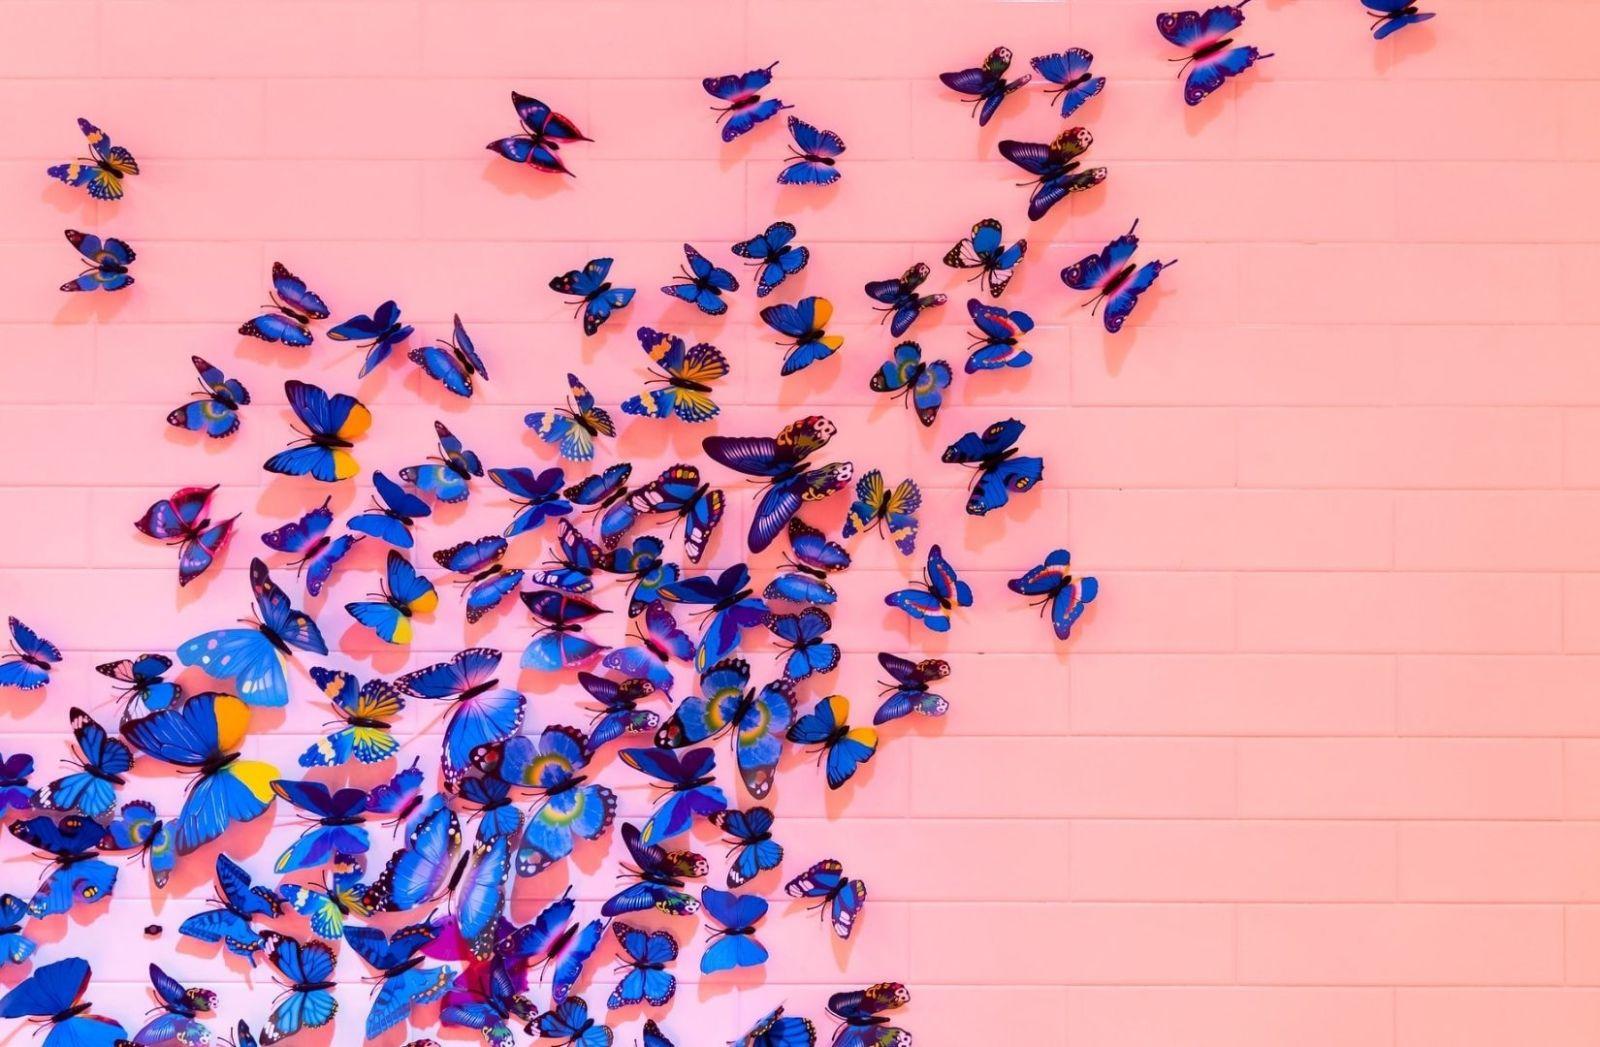 Der Flügelschlag der Schmetterlinge als Vision. (Foto: Drz, Unsplash.com)